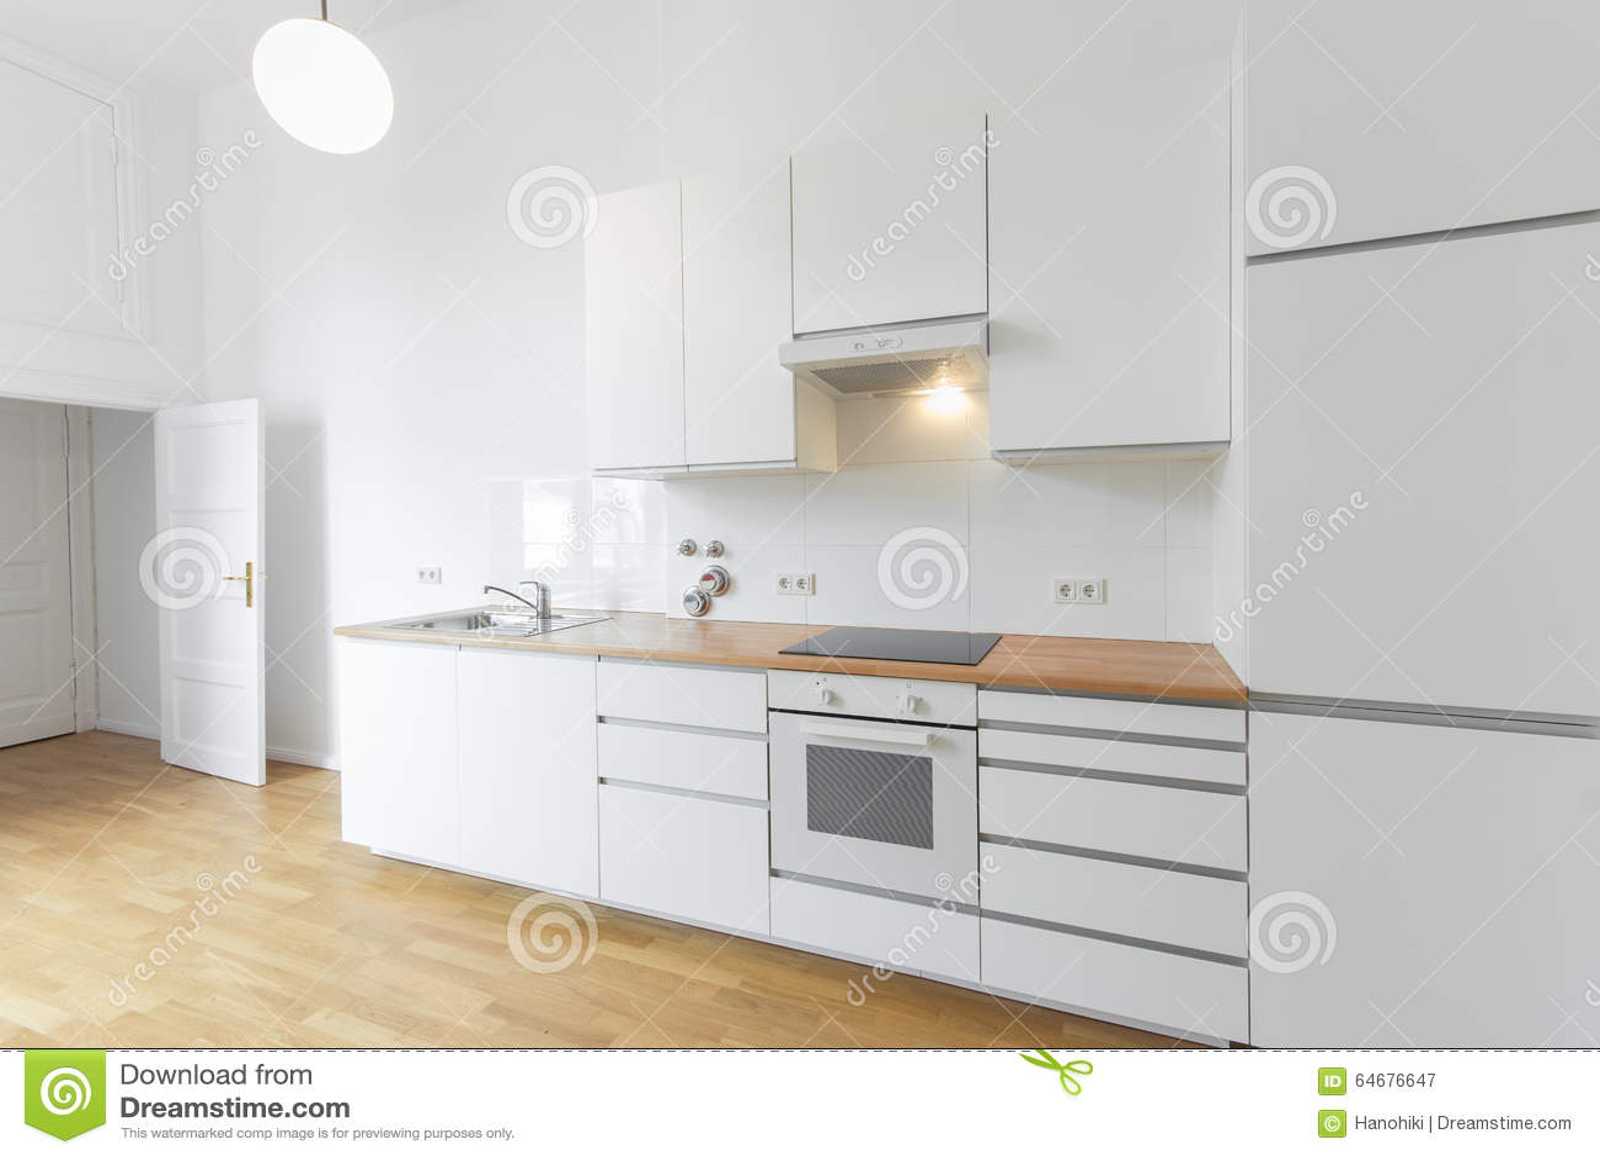 Keuken met kookeiland en teller - Hout en witte keuken ...